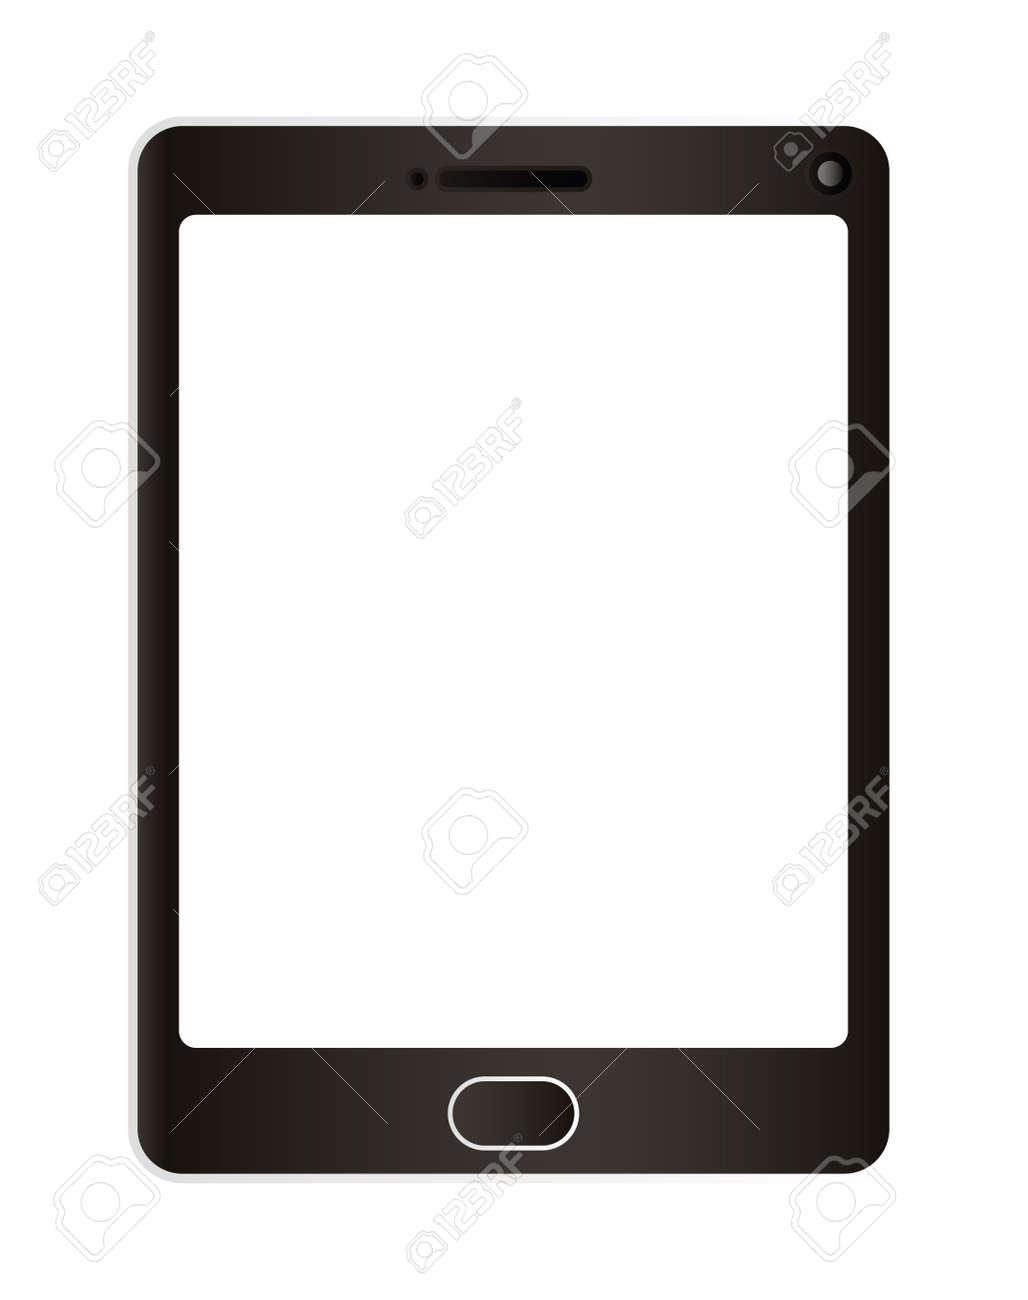 tablet design, Digital technology communication social media internet web and wireless theme Vector illustration - 154137682